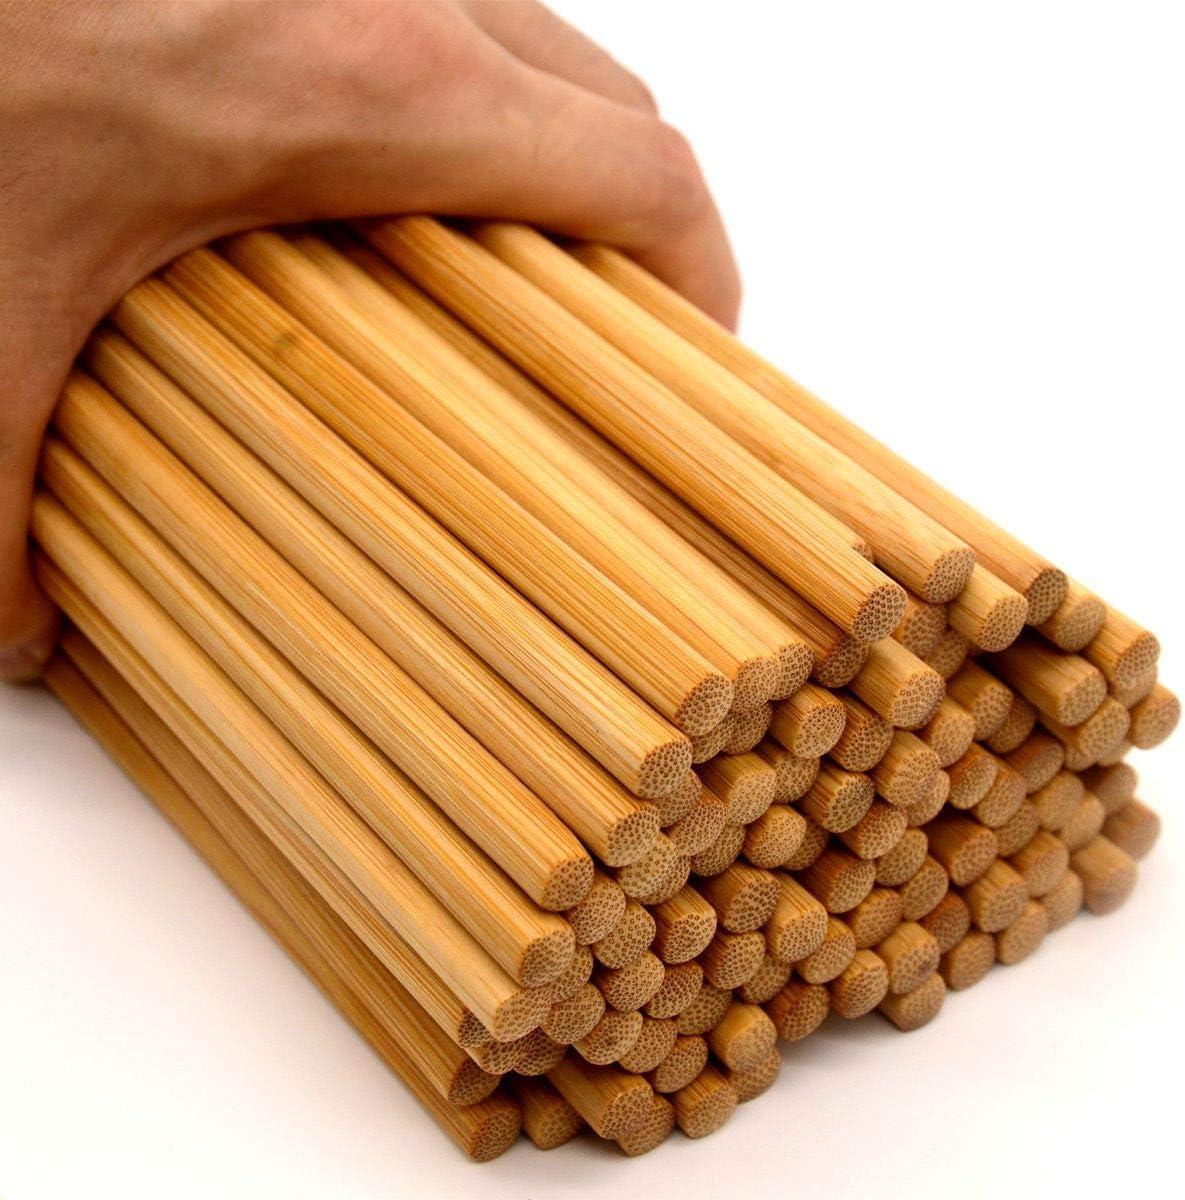 Details about  /10-Pairs Reusable Bamboo Chopsticks Set Travel Chopsticks with Case Reusable...